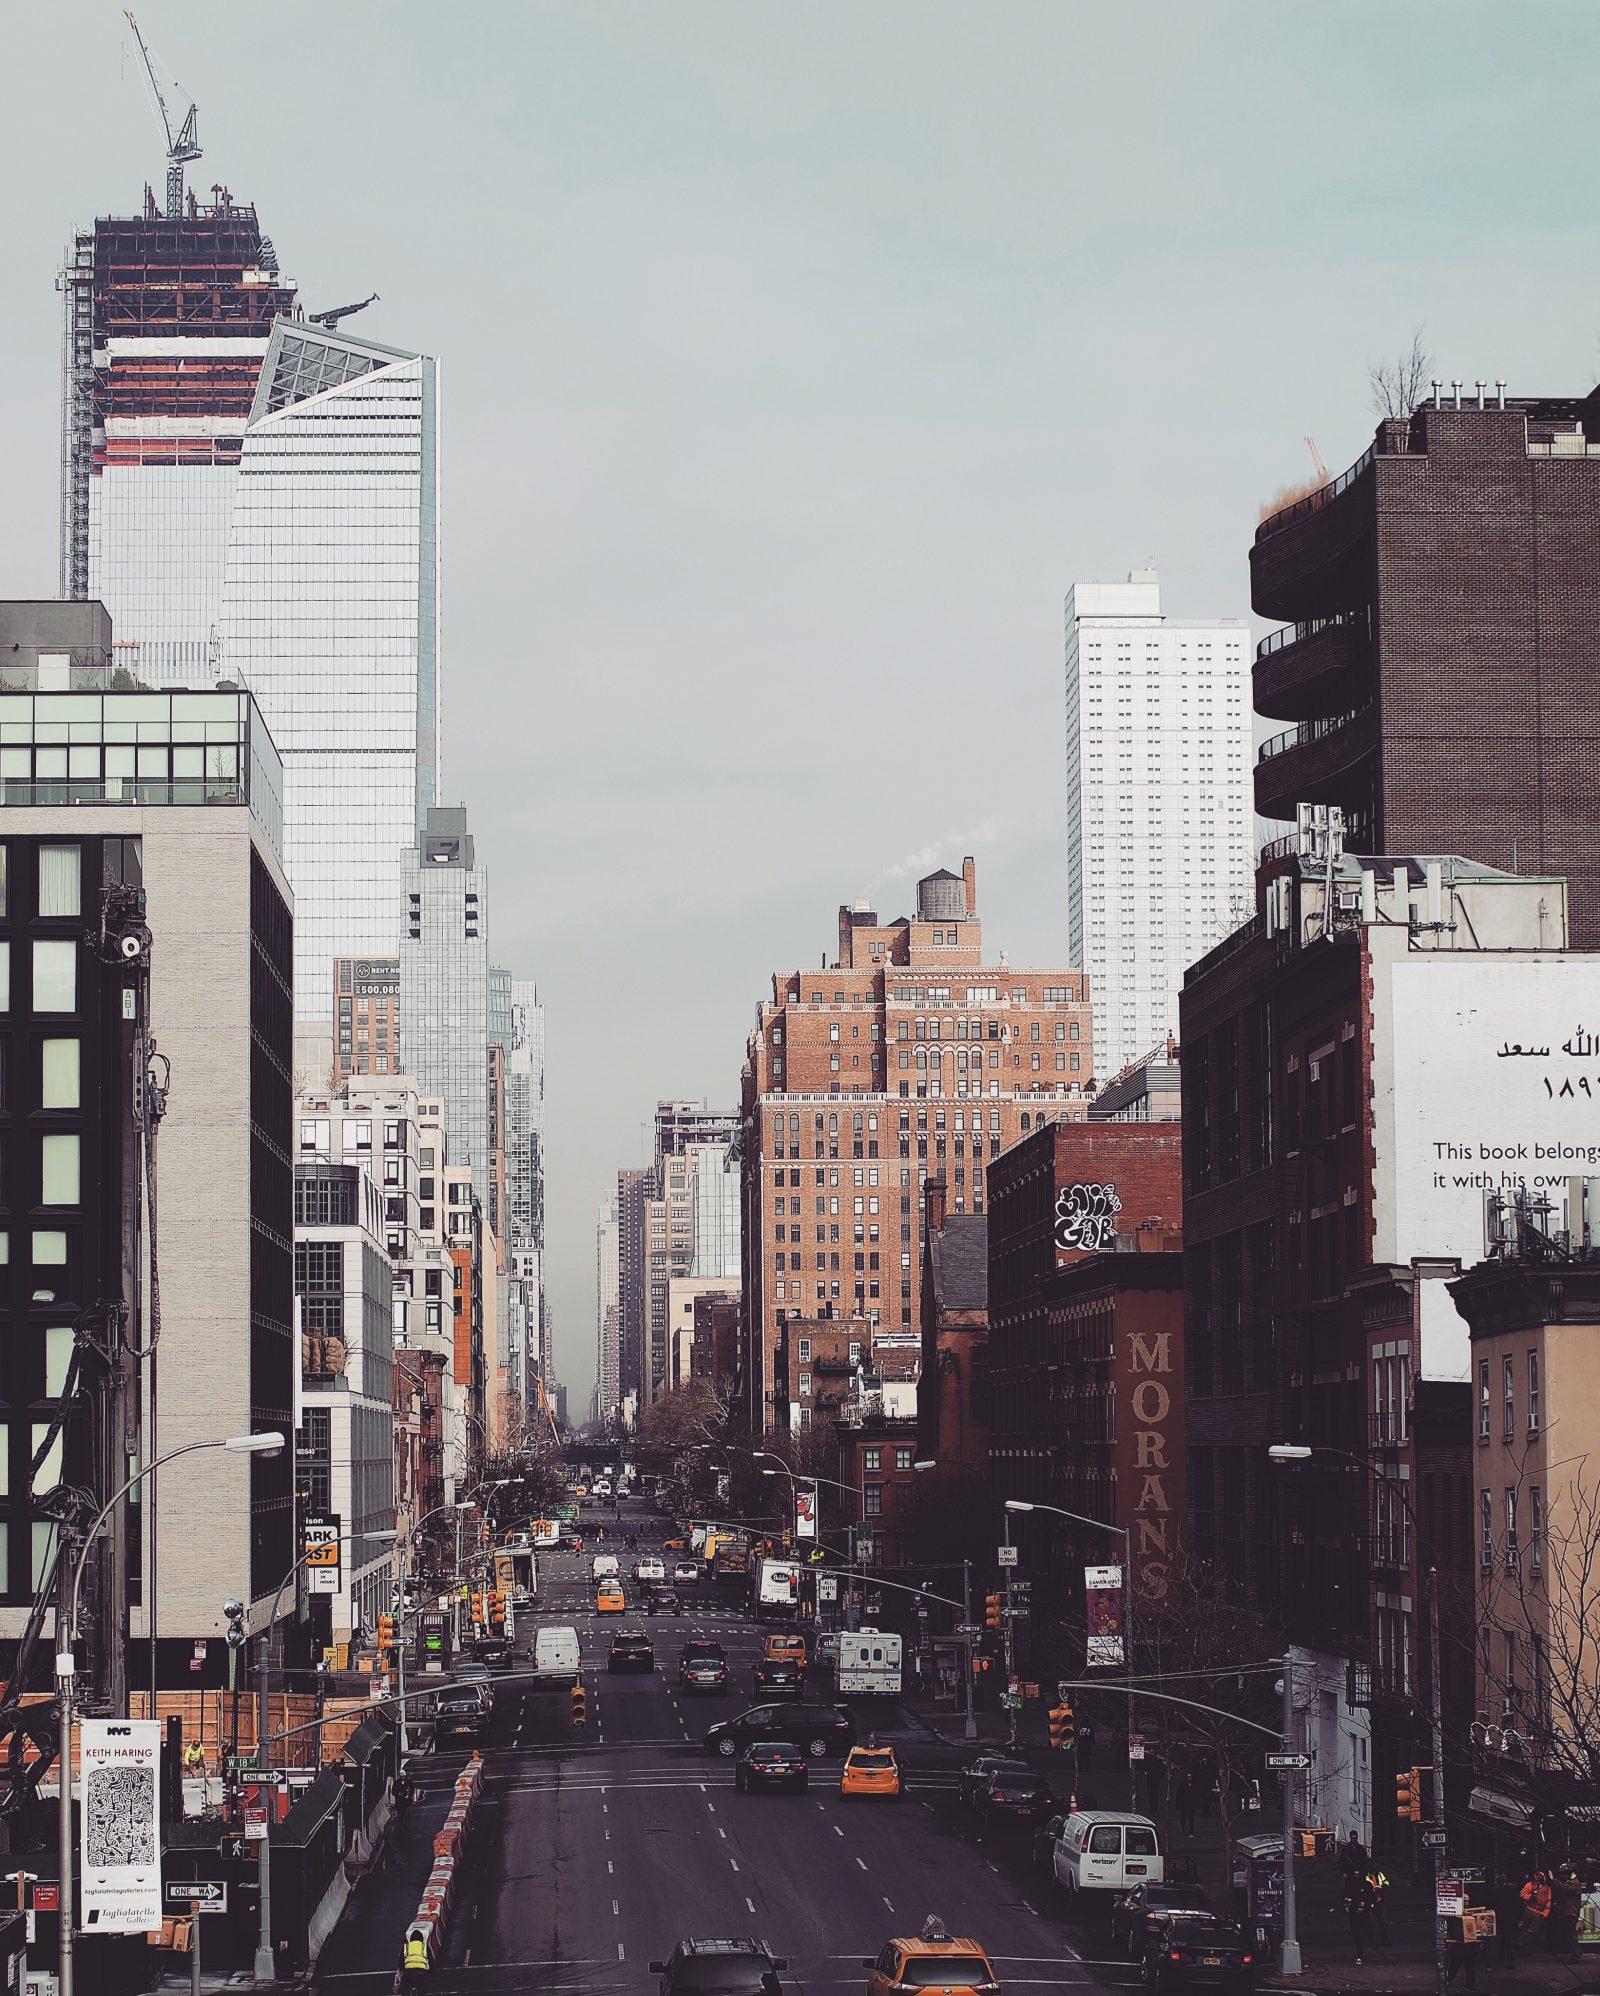 New York in 4 Days - The Highline